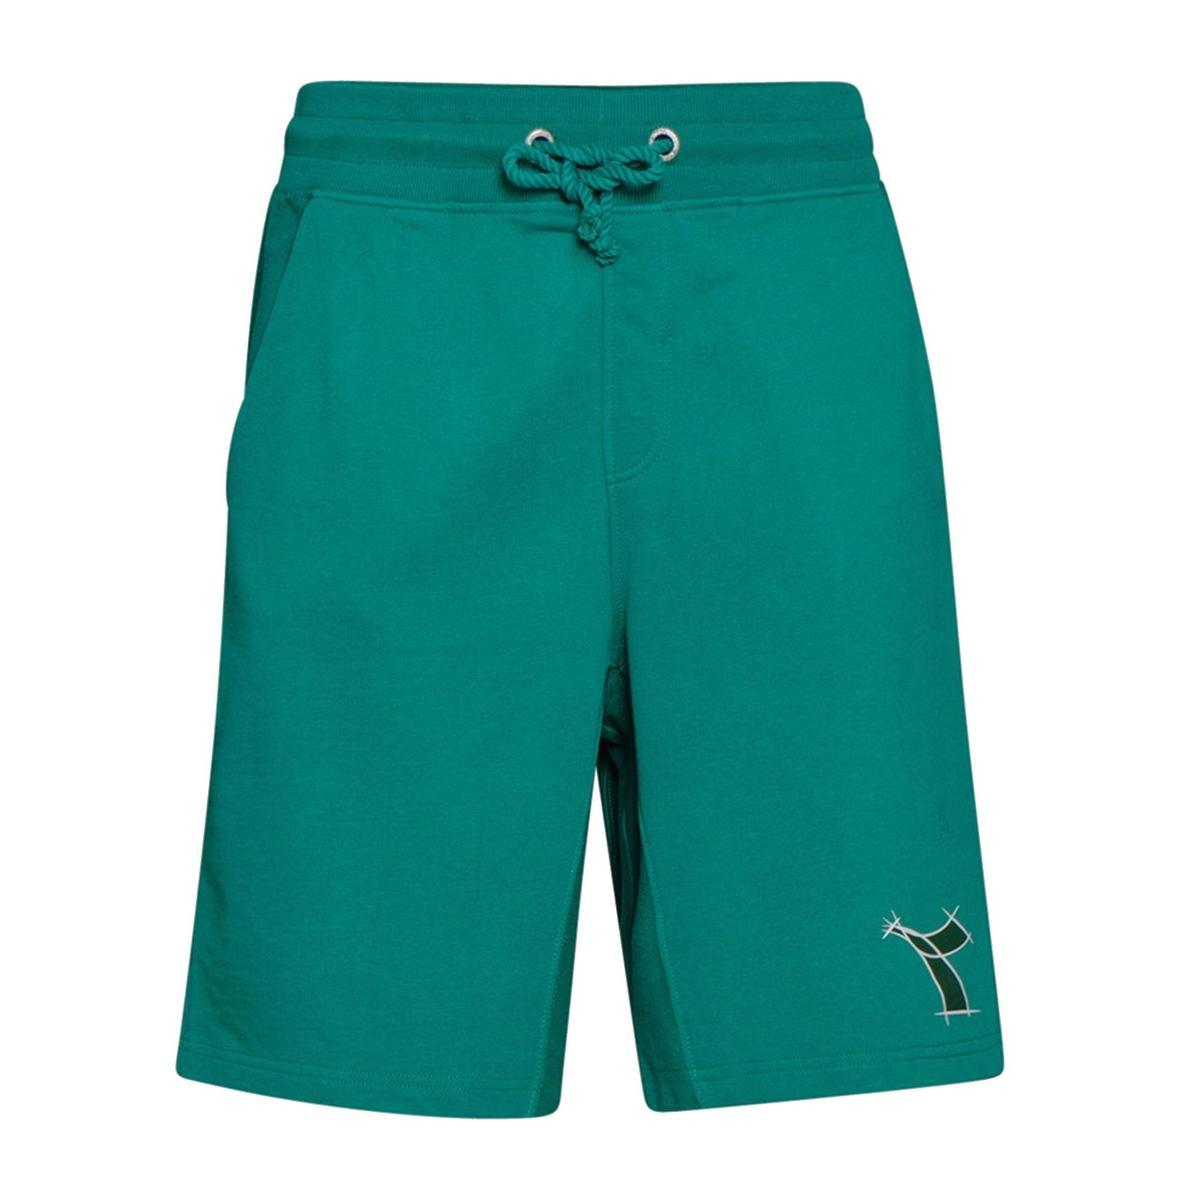 Bermuda pantaloncino Diadora BERMUDA FREGIO da uomo rif. 102.174260